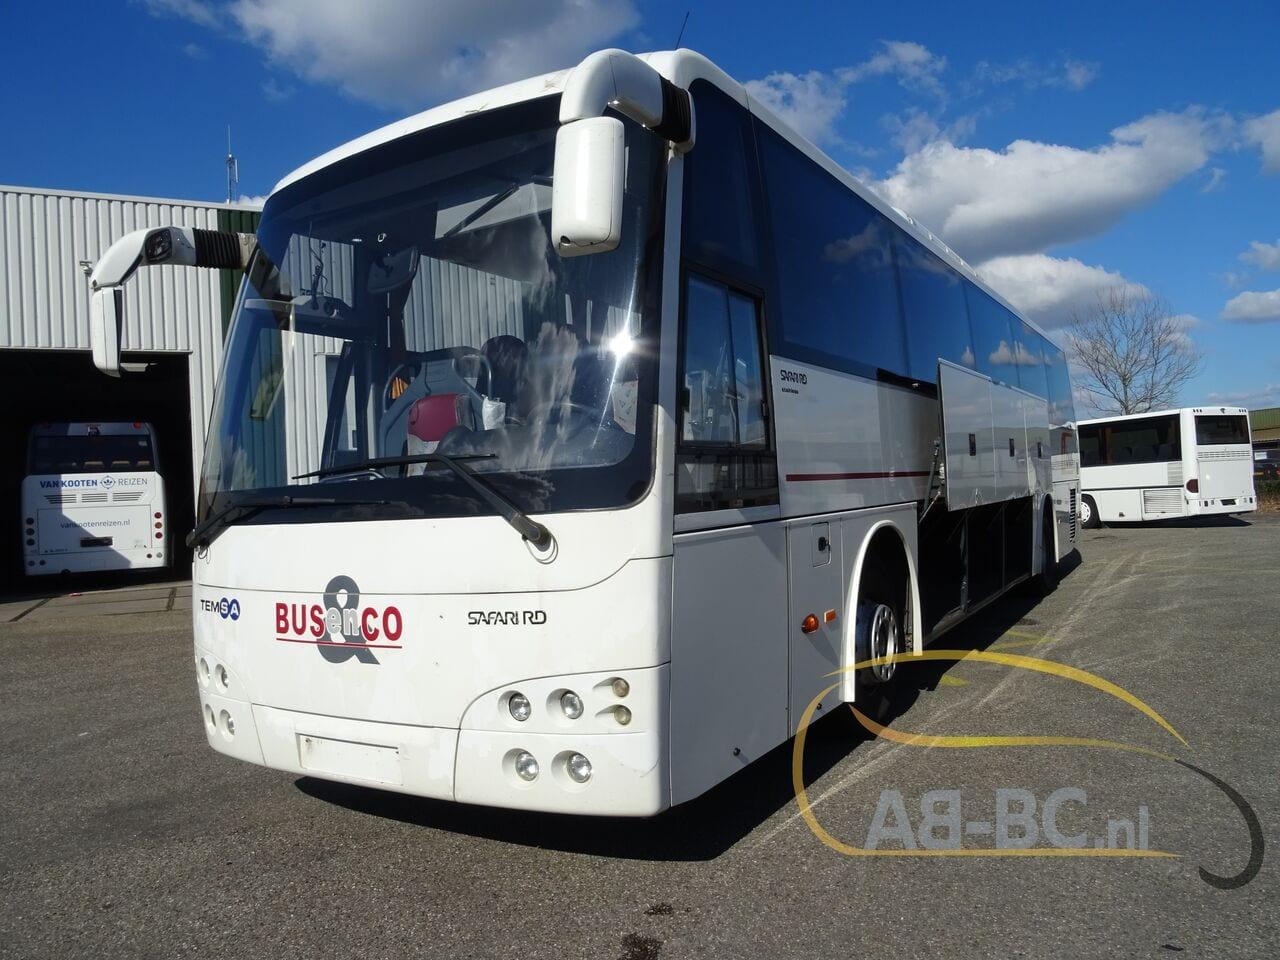 coach-busTEMSA-Safari-RD-53-Seats-DAF-Motor-12-mtr---1616166525431815147_big_87471cee378a8c03df81022f9409278a--21031917053743807500